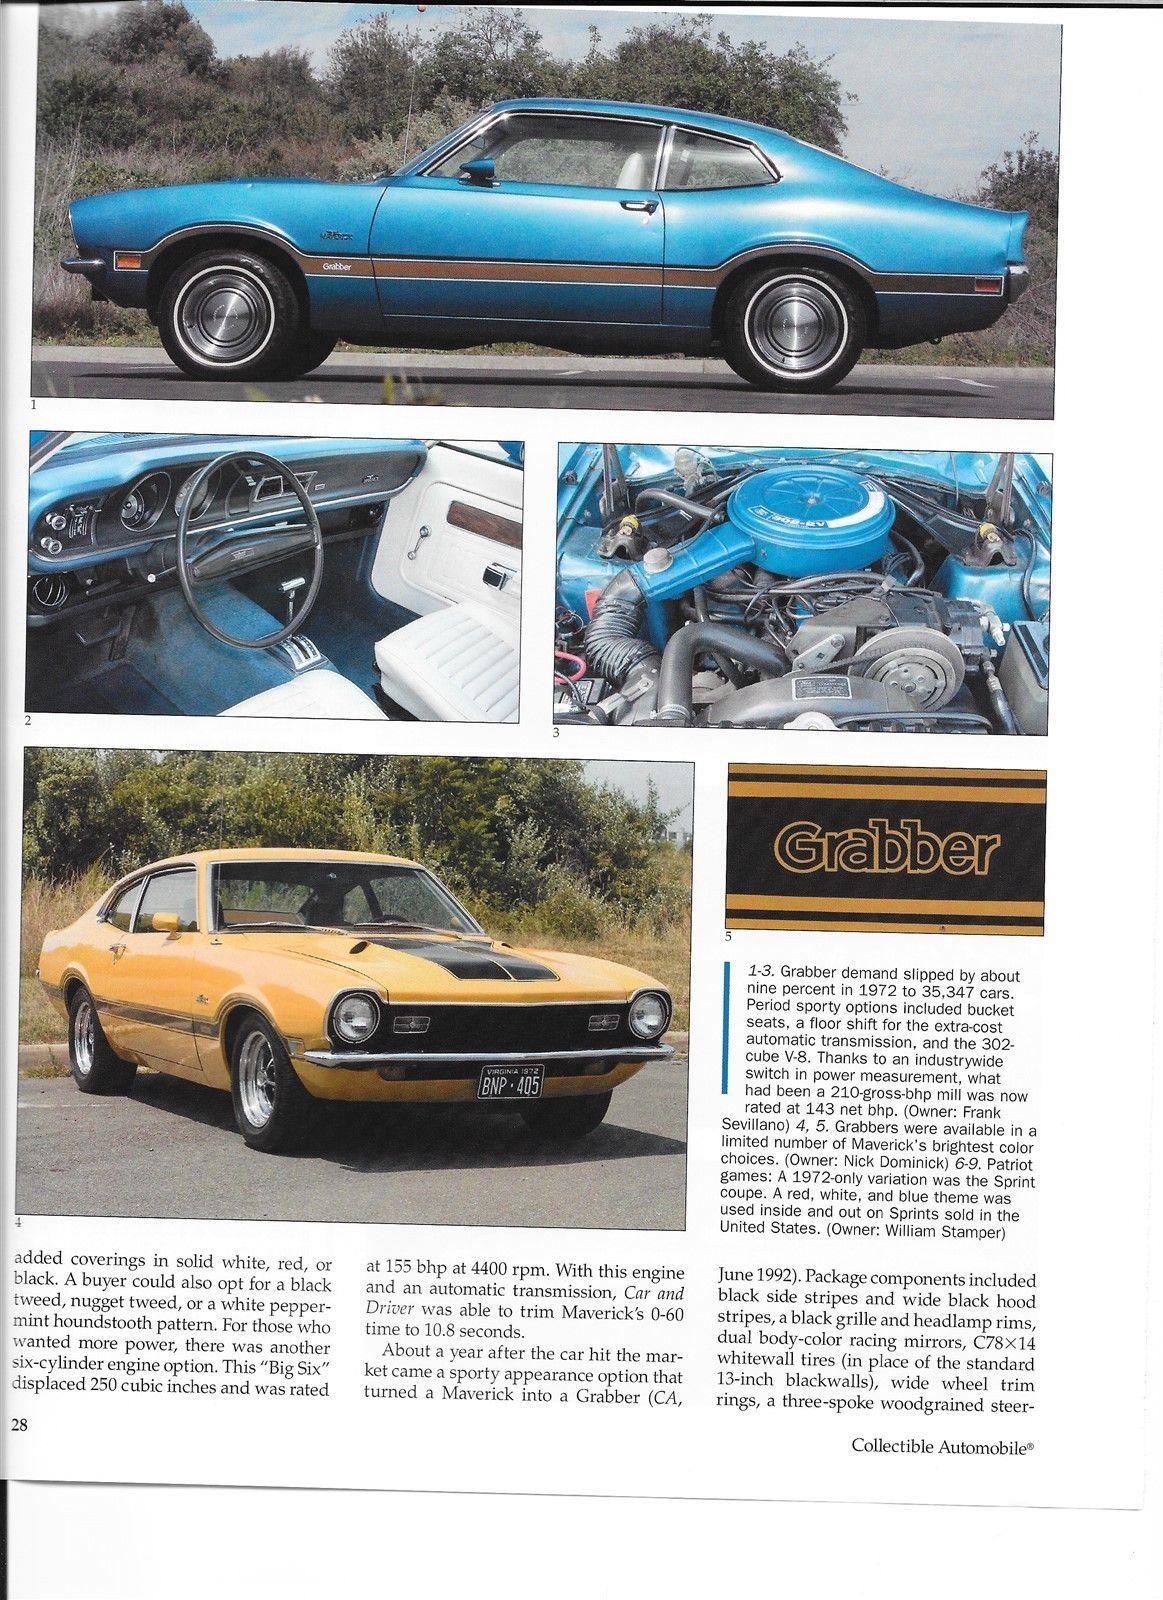 1970 1971 1972 1973 1974 1975 1976 1977 Ford Maverick 12 Pg Color